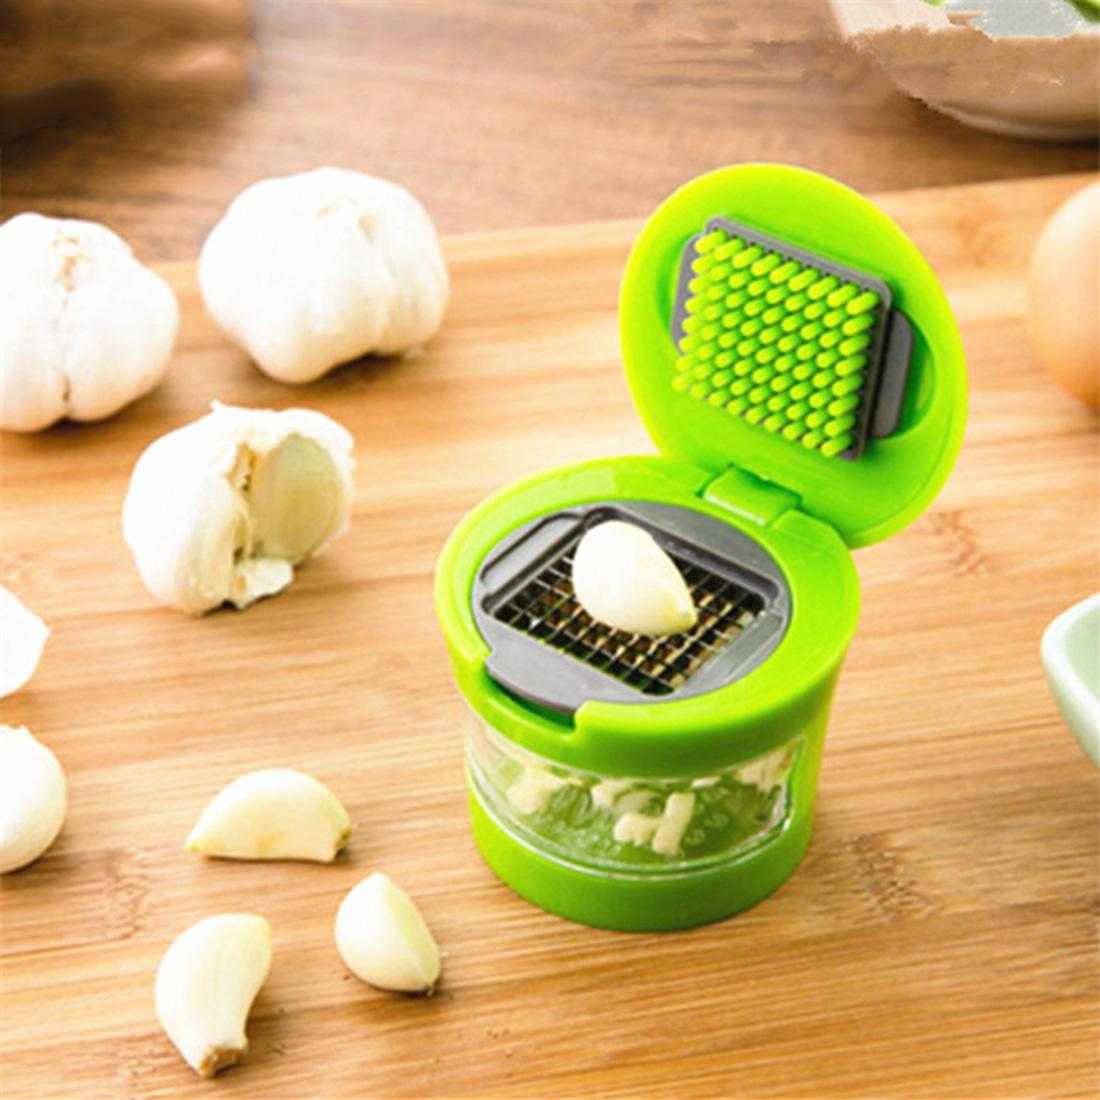 Practical Garlic Chopper Plastic Stainless Steel Garlic Press Multi Functional Ginger Mashing Machine Kitchen Tools(China (Mainland))